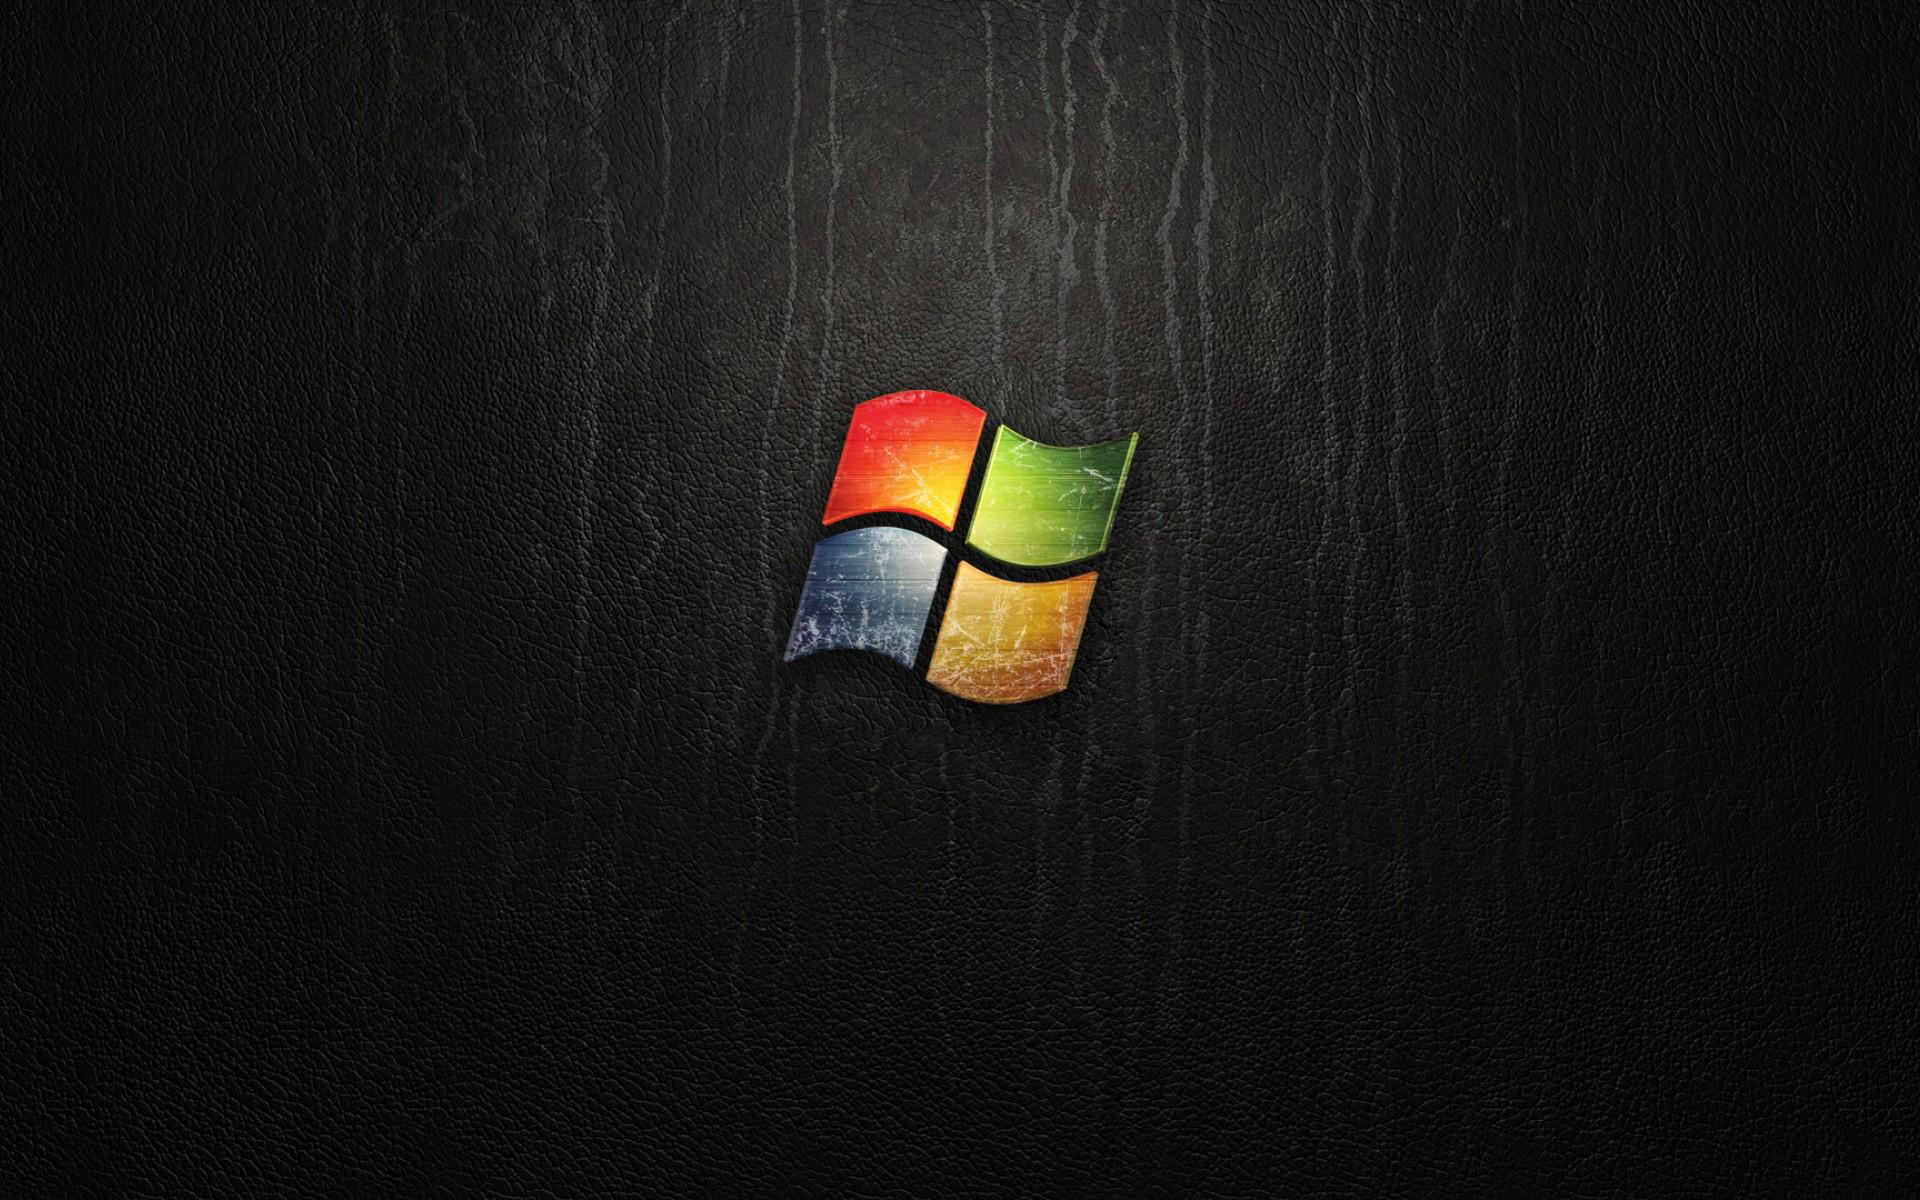 Windows 8 Logo photo - 1